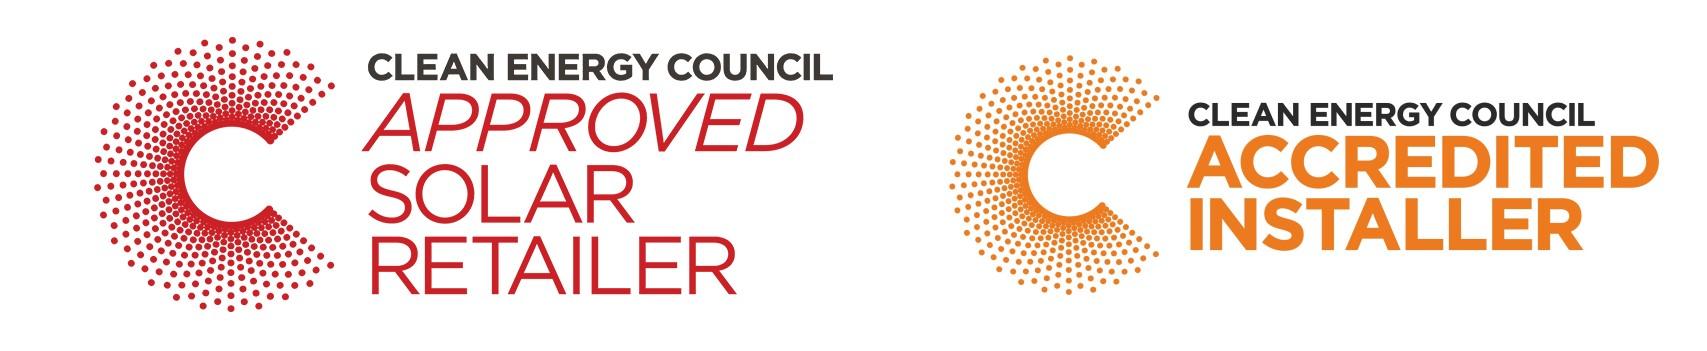 Clean Energy Council Soalr